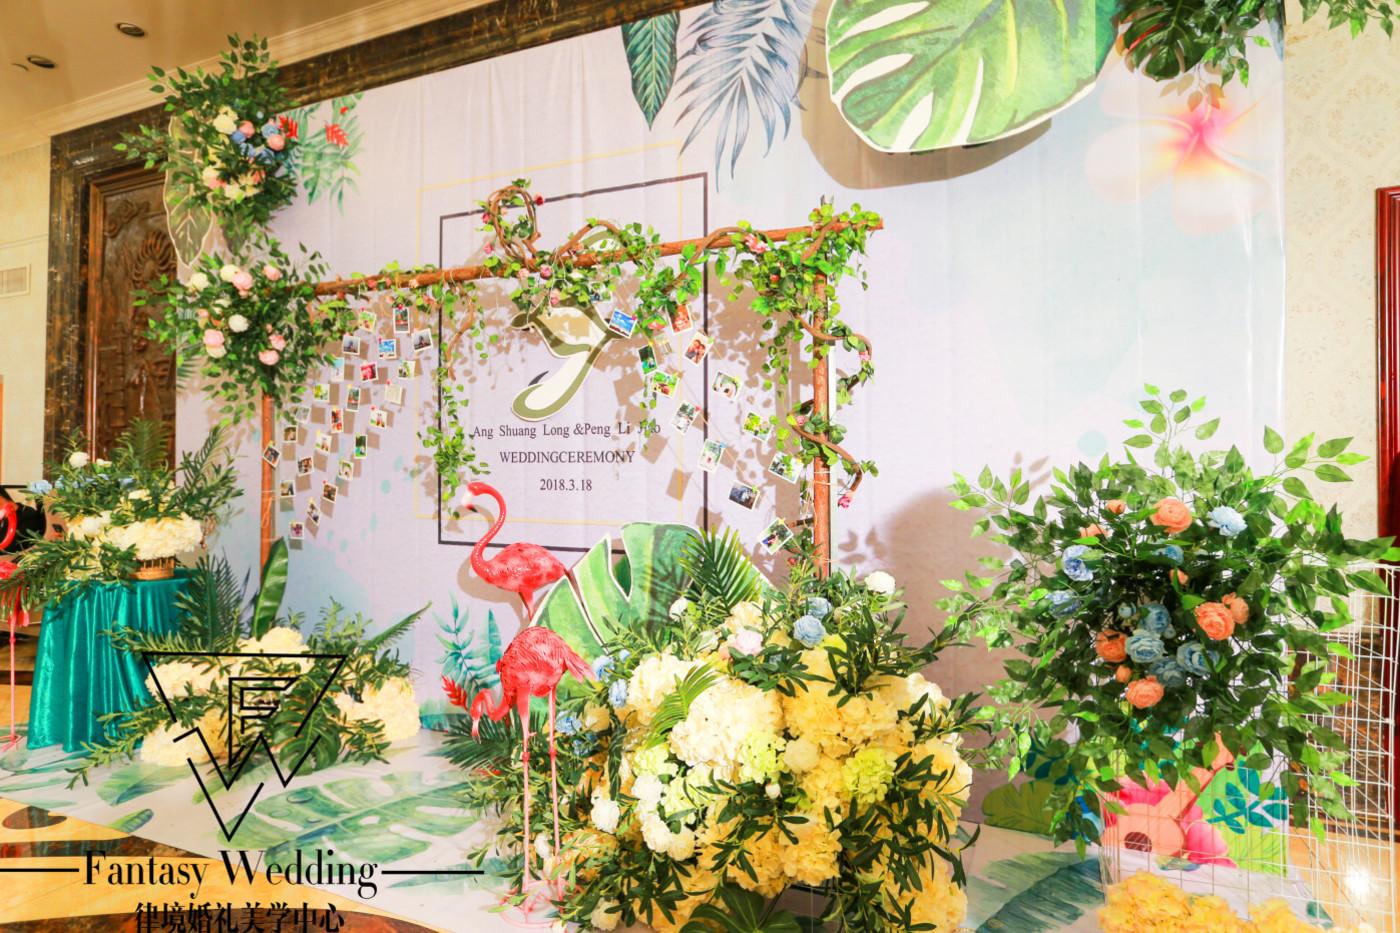 「Fantasy Wedding」& A/P 南艳湖18